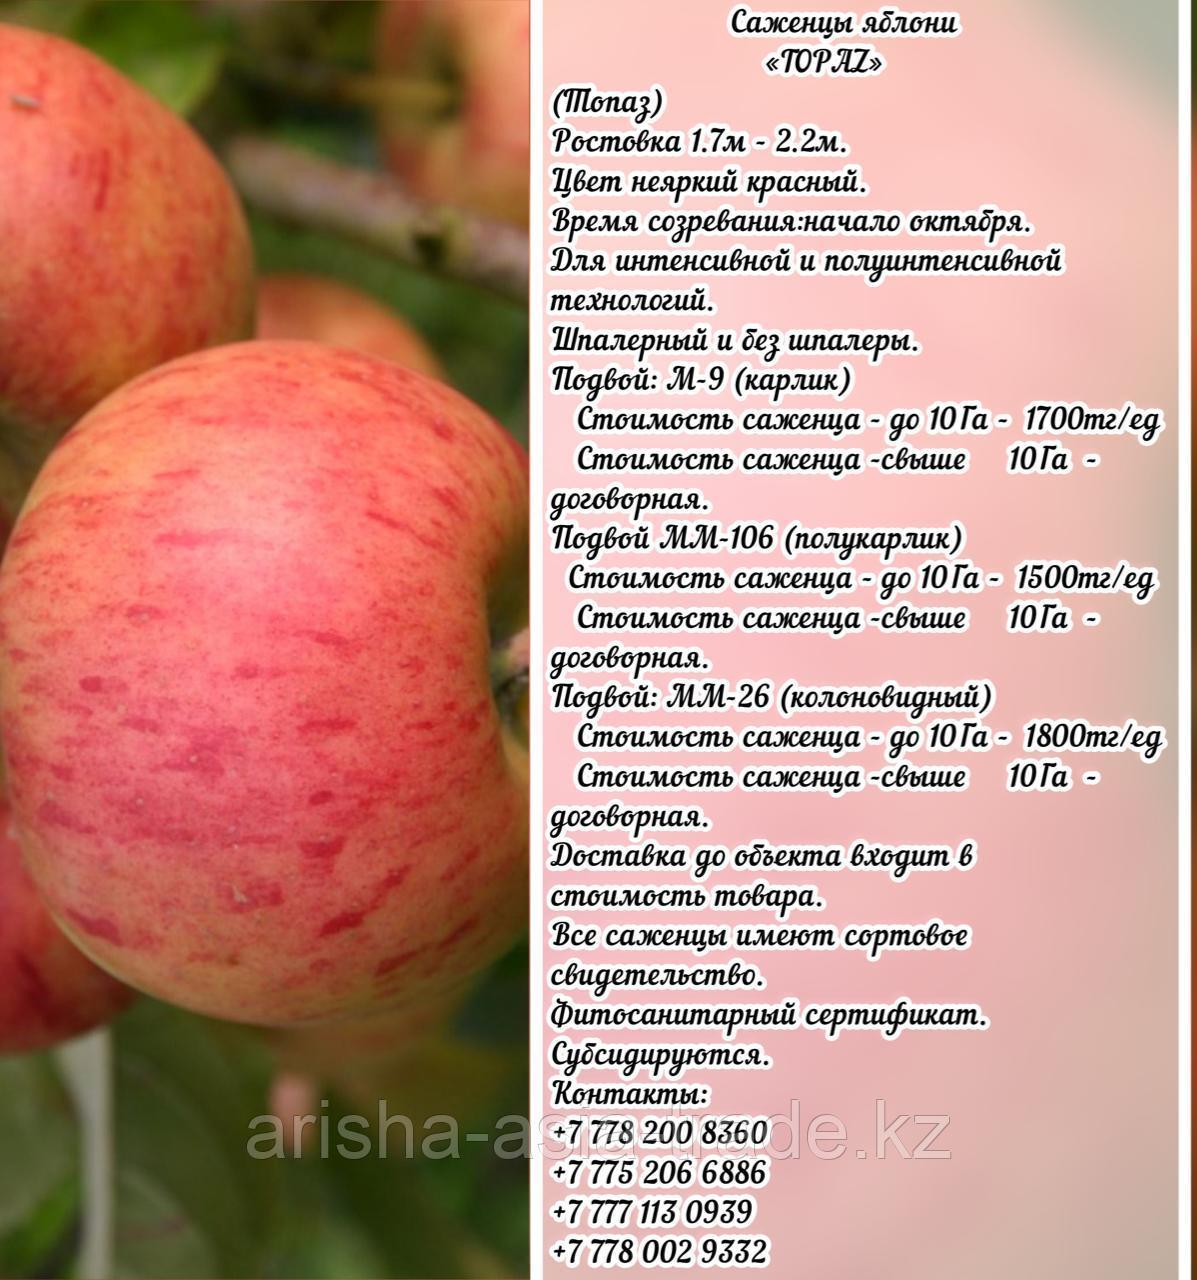 "Саженцы яблони ""Topaz"" (Топаз) ММ 26 Сербия"